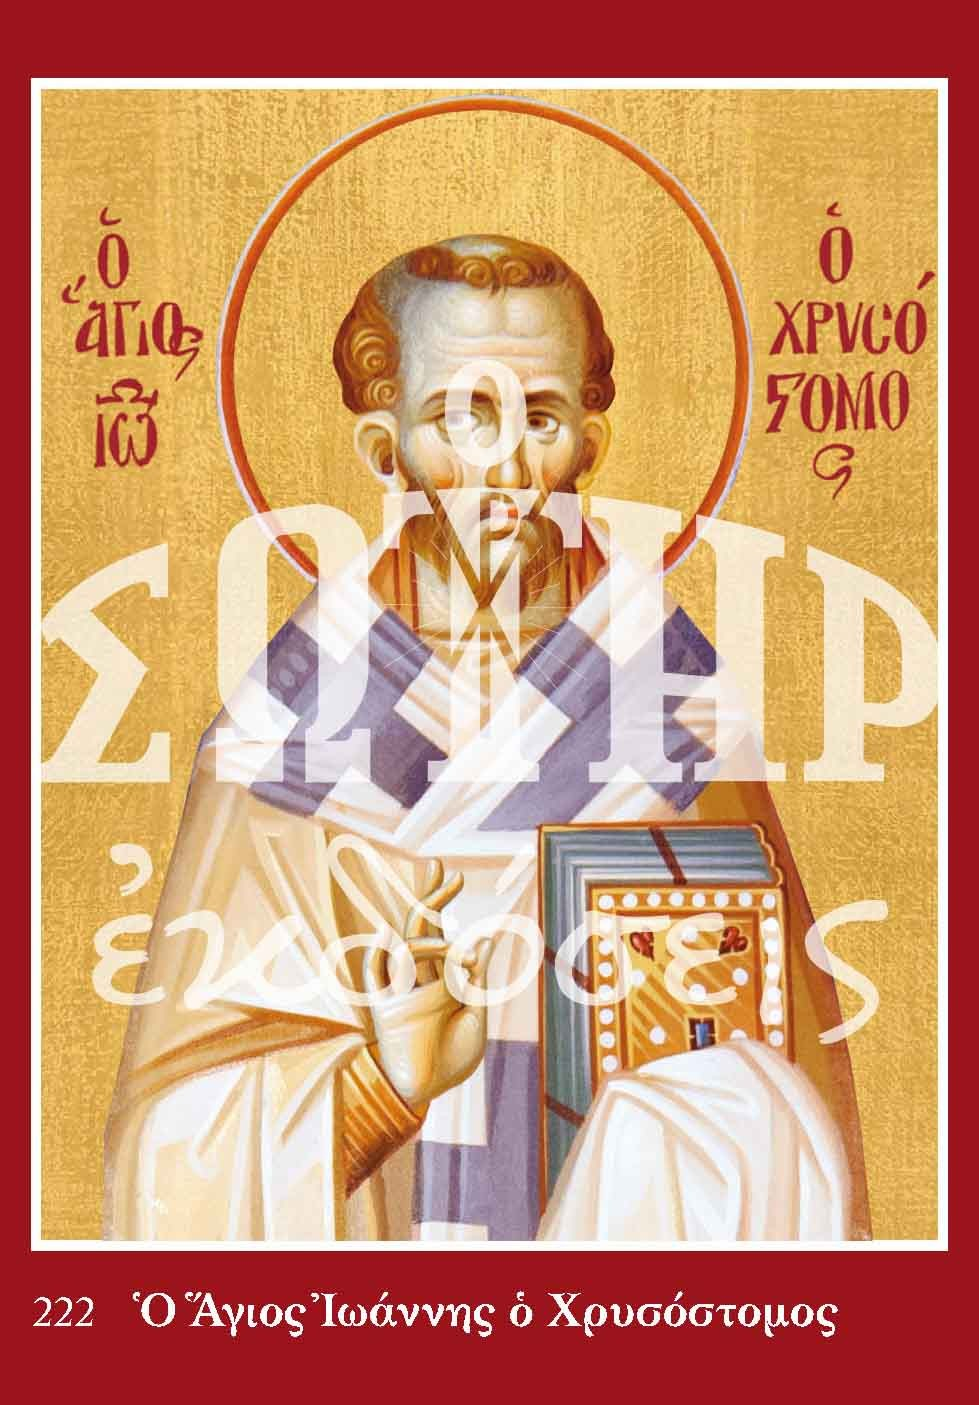 Άγιοι ΑΓΙΟΣ ΙΩΑΝΝΗΣ Ο ΧΡΥΣΟΣΤΟΜΟΣ 222